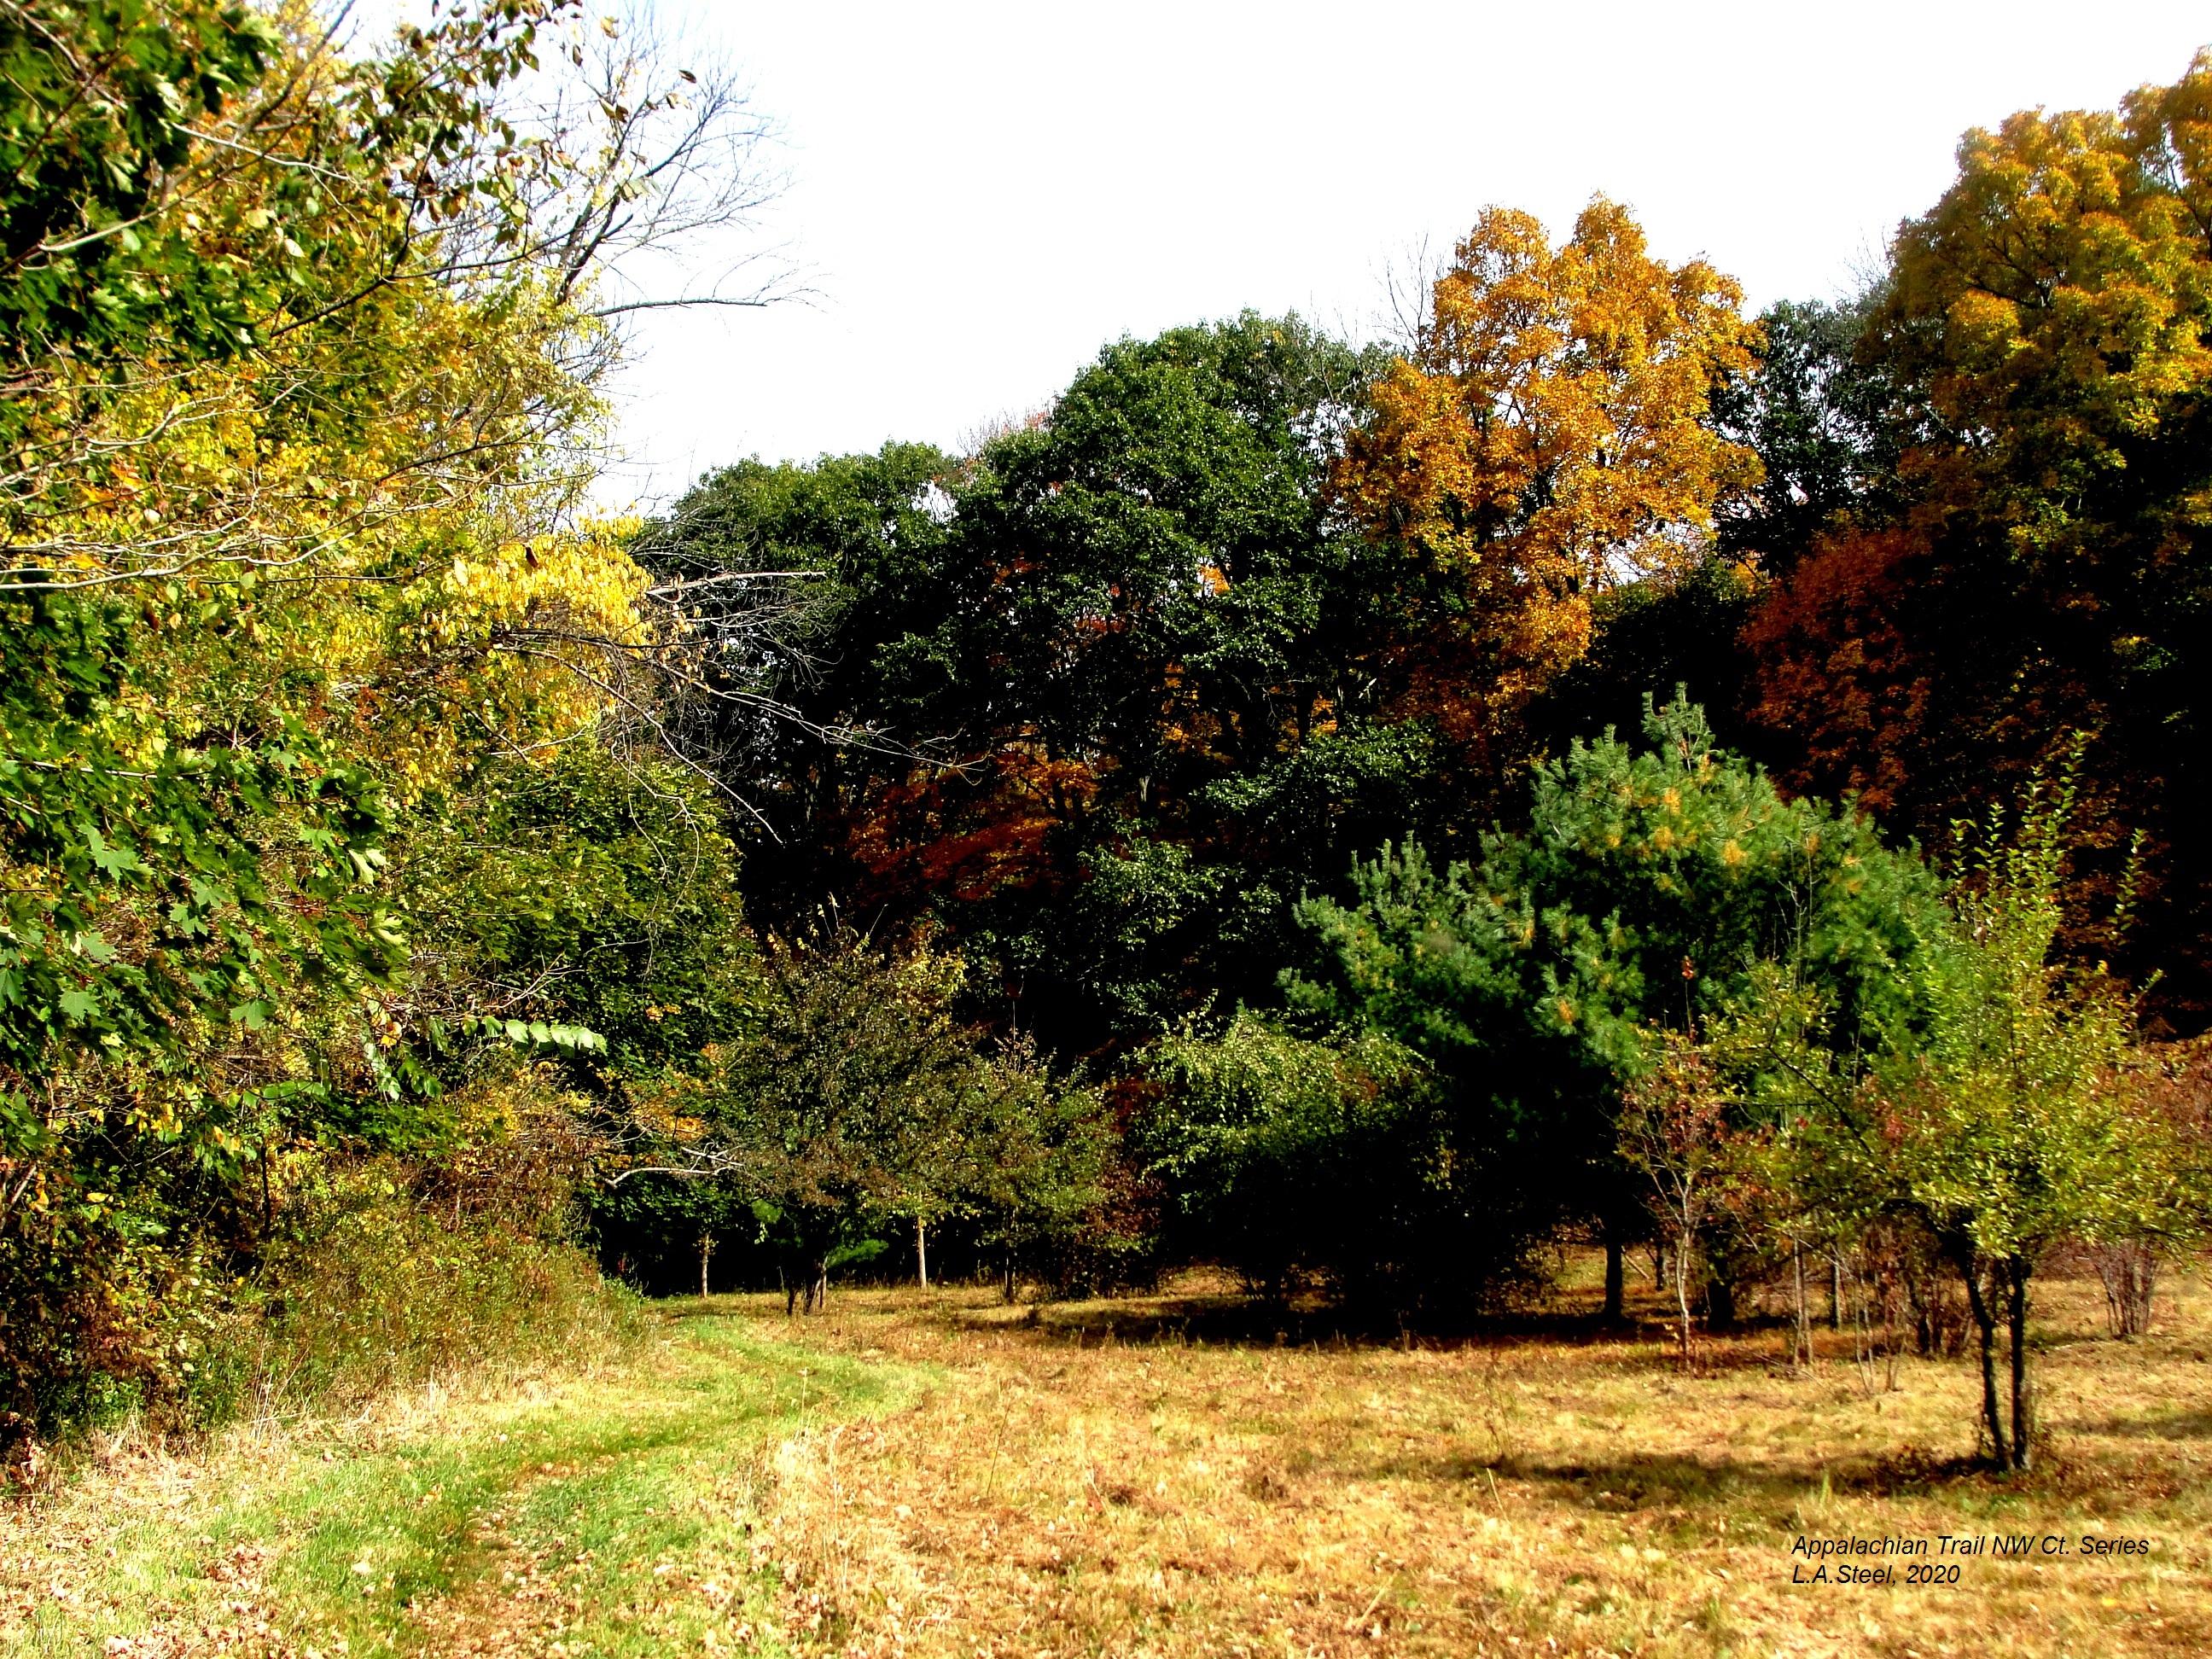 appalachian trail nw ct series 1 2020